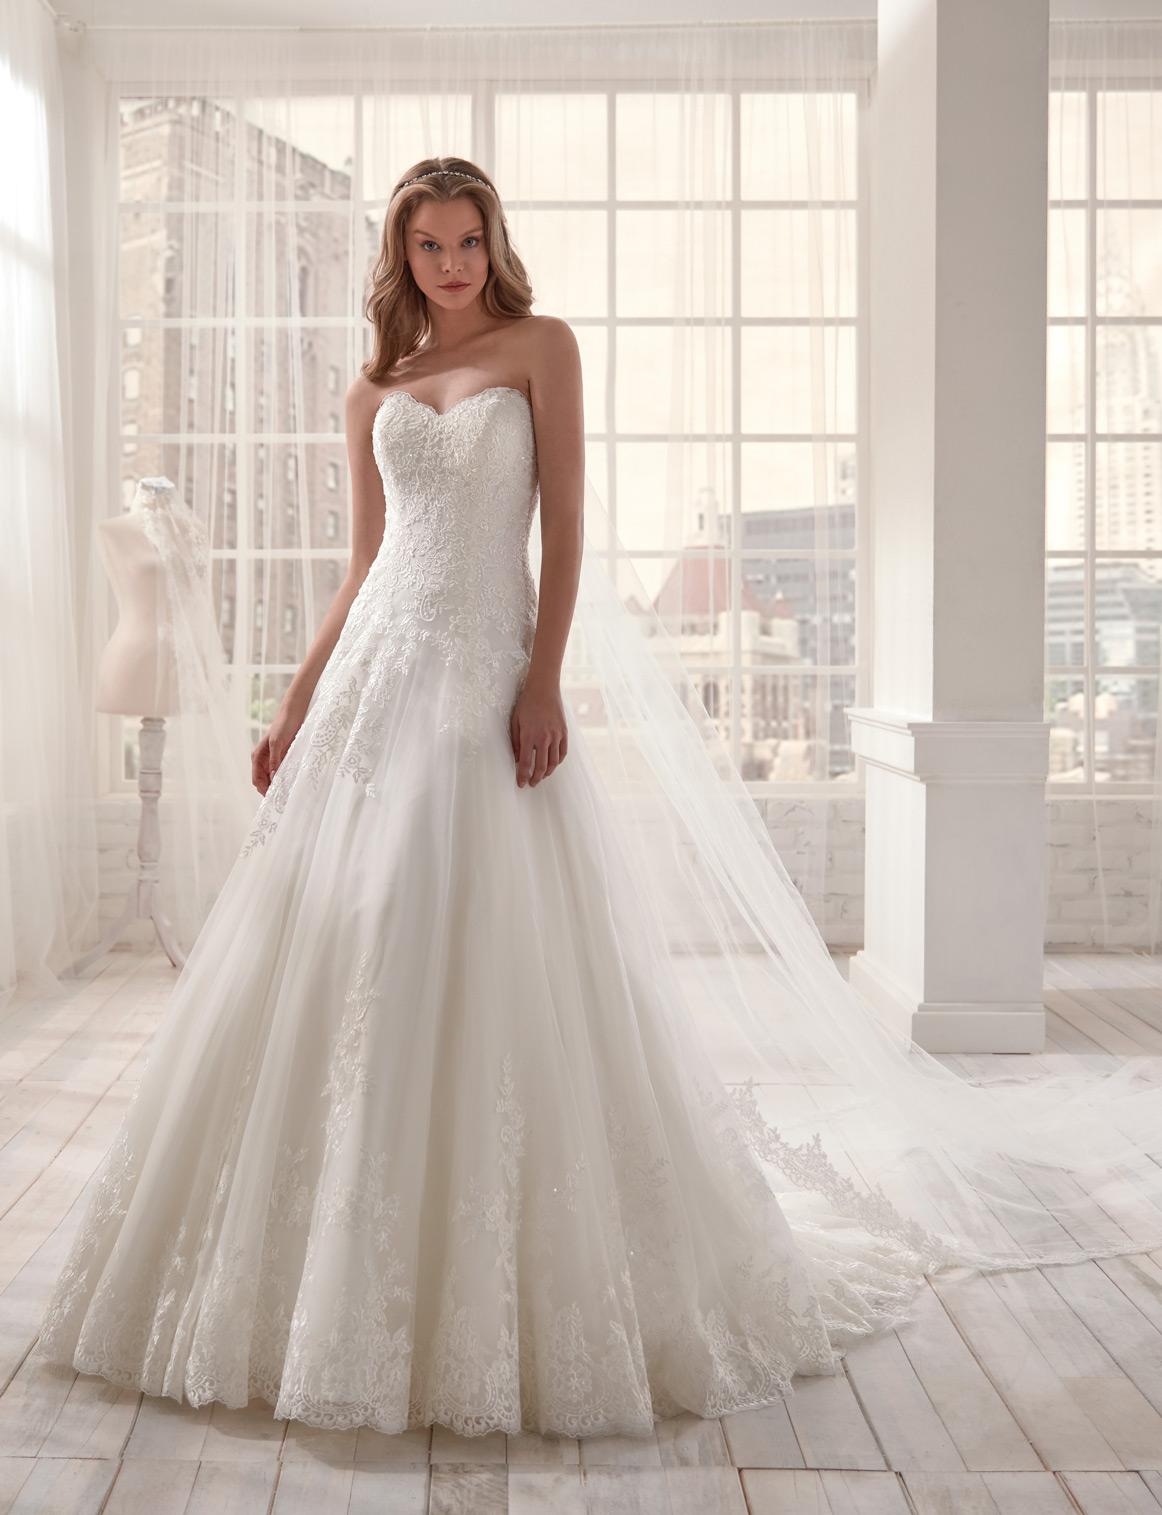 Vestiti Da Sposa Jolies.Abito Da Sposa Jolies 2020 Joa20931 Mariages It Abiti Sposa